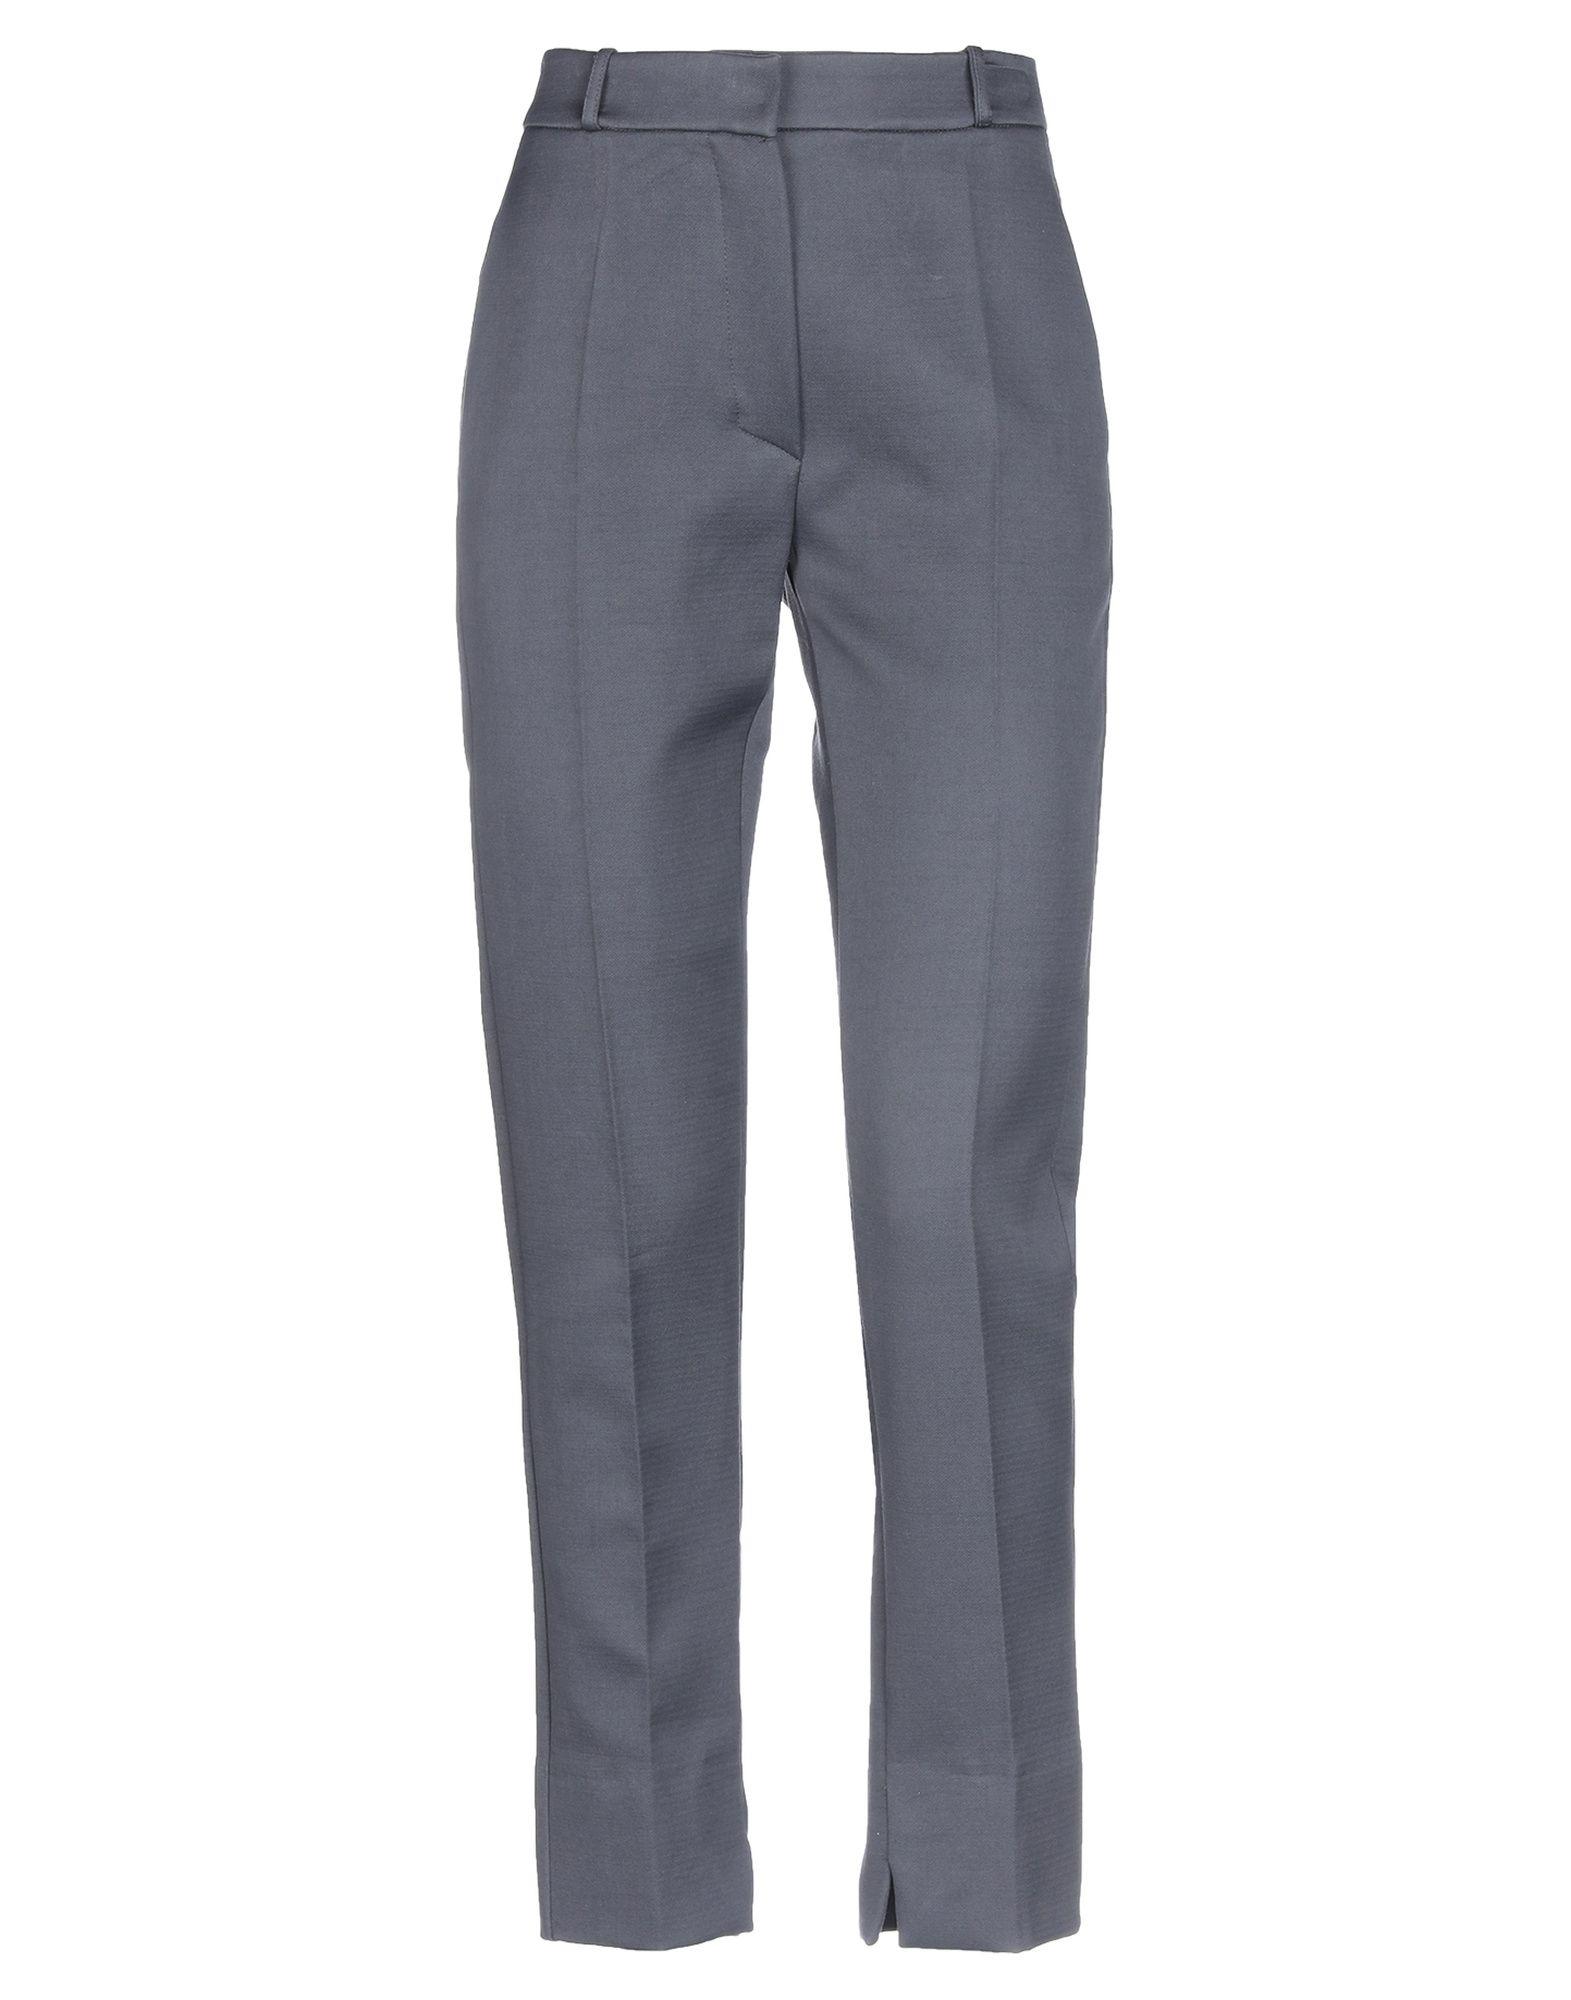 Pantalone Gareth Pugh Pugh Pugh donna - 13313365GR 414